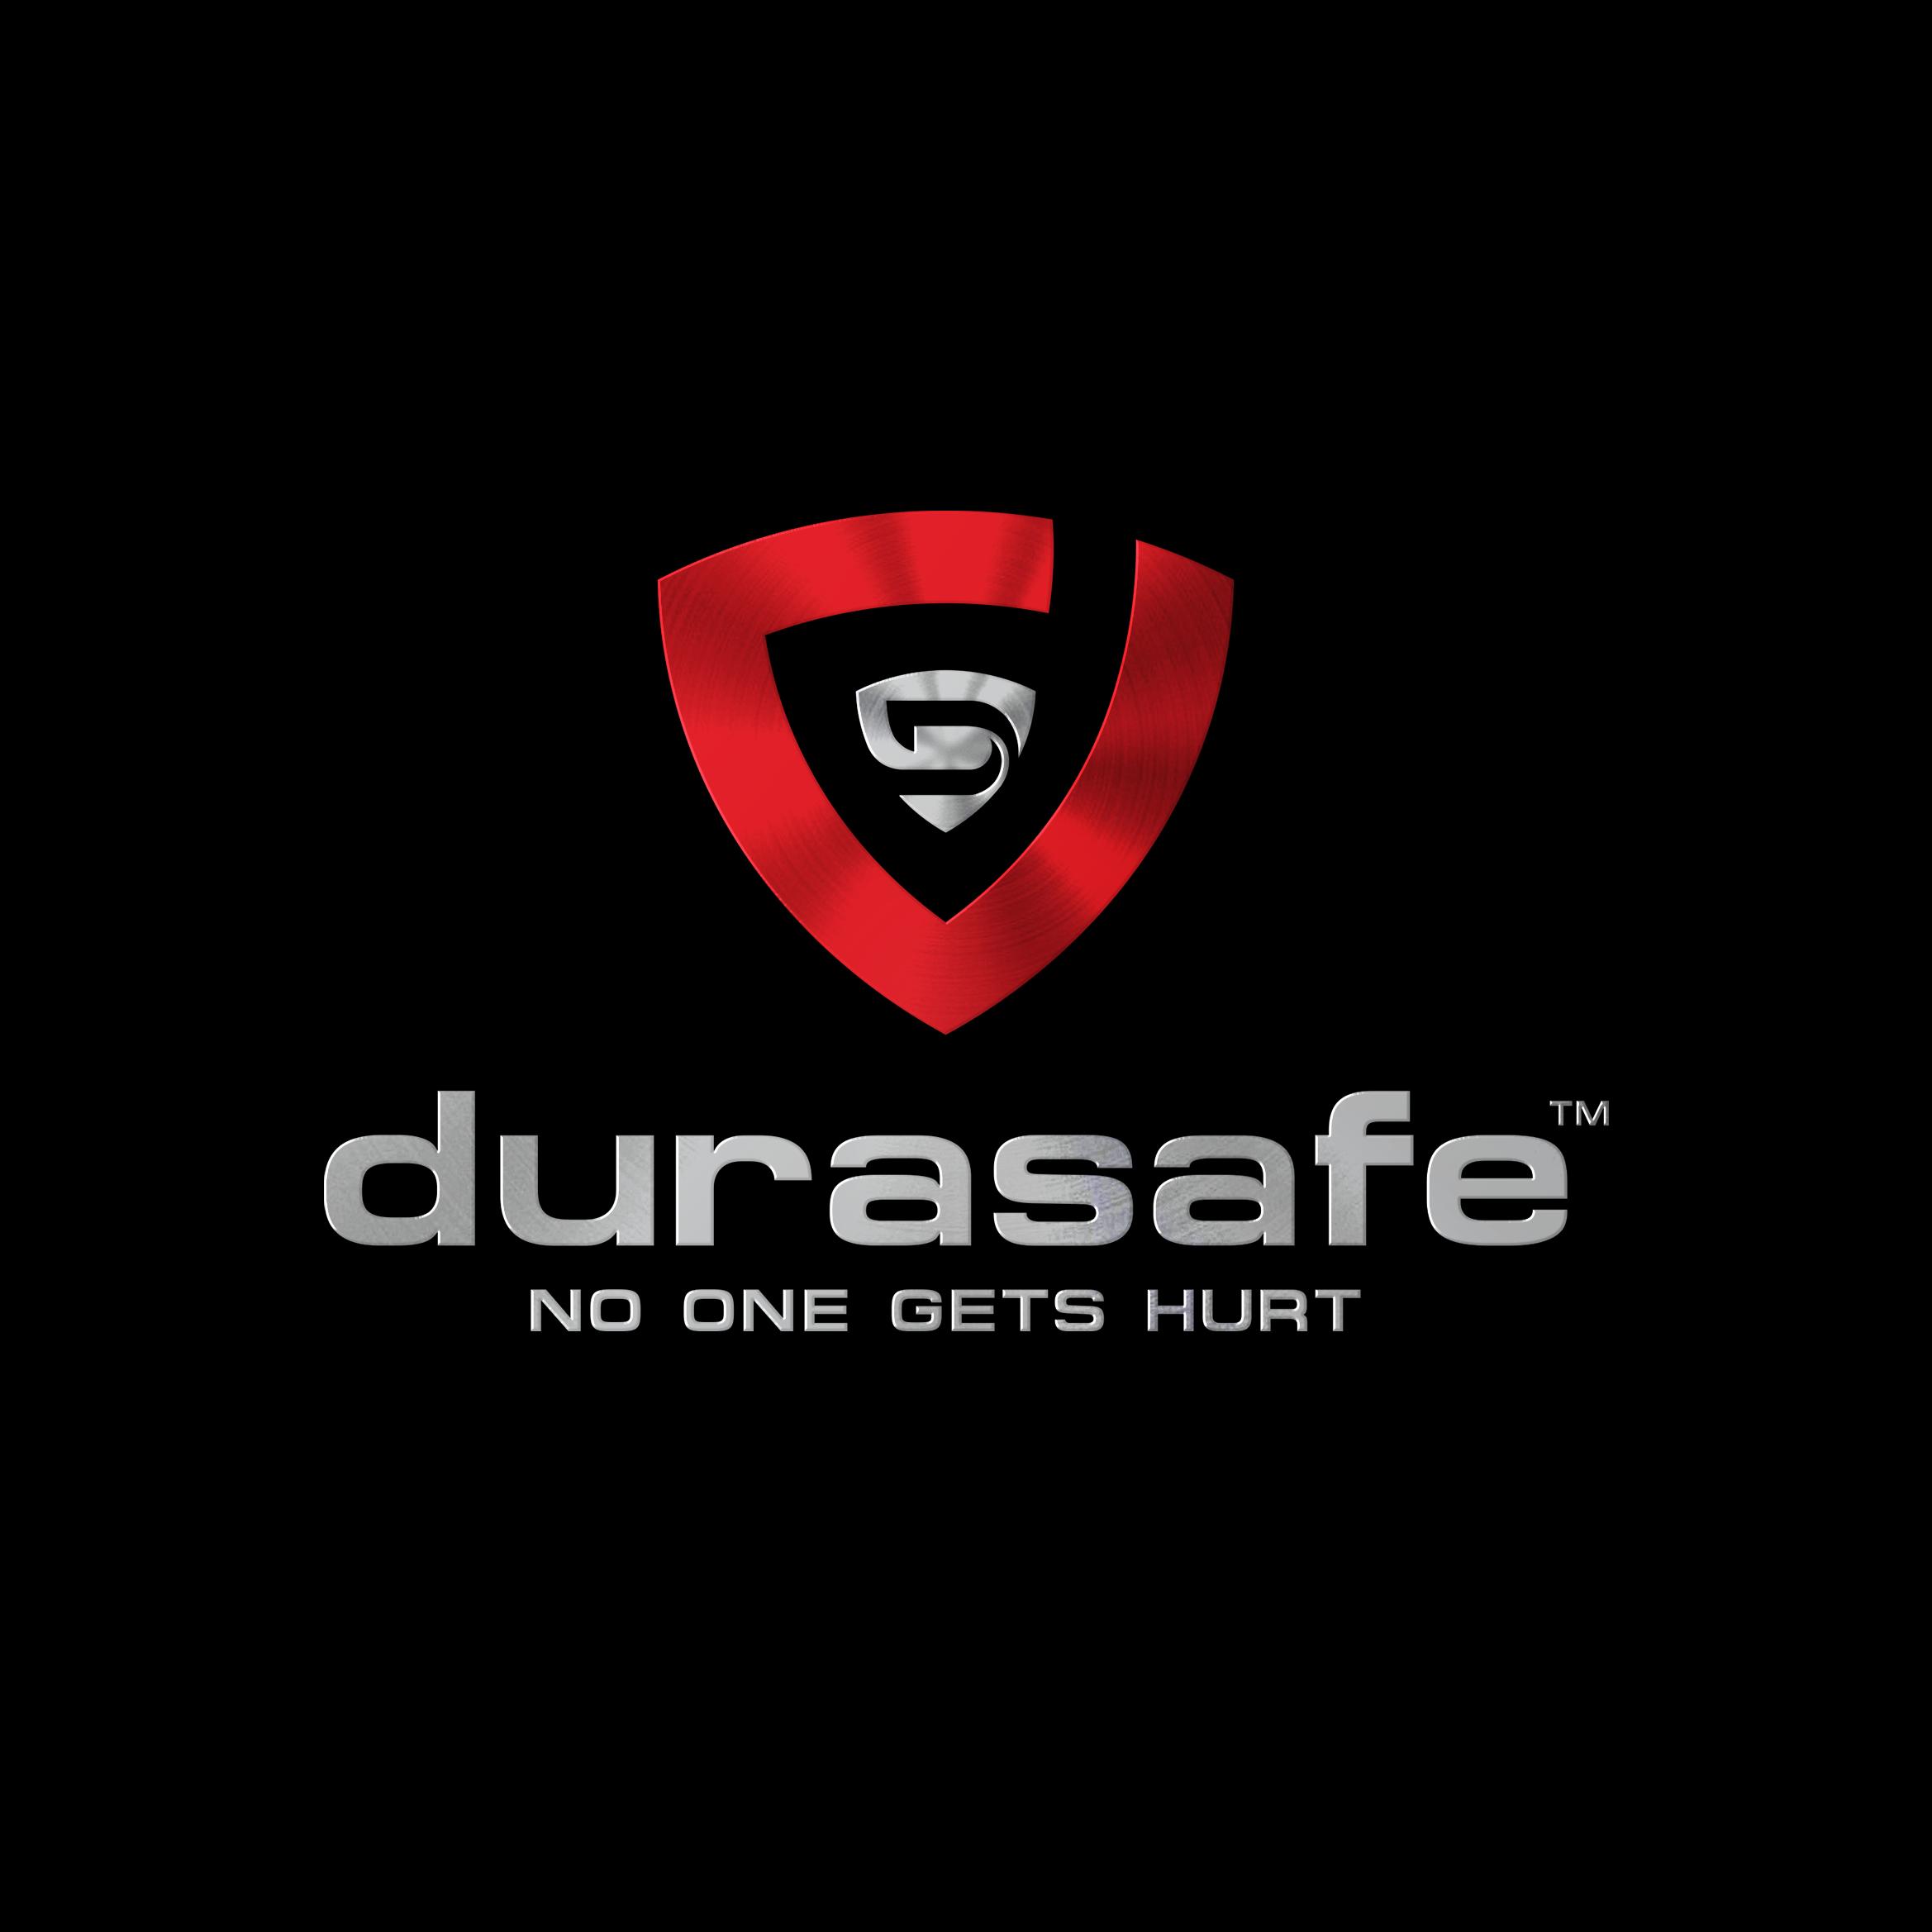 Durasafe rebranding for 40th anniversary